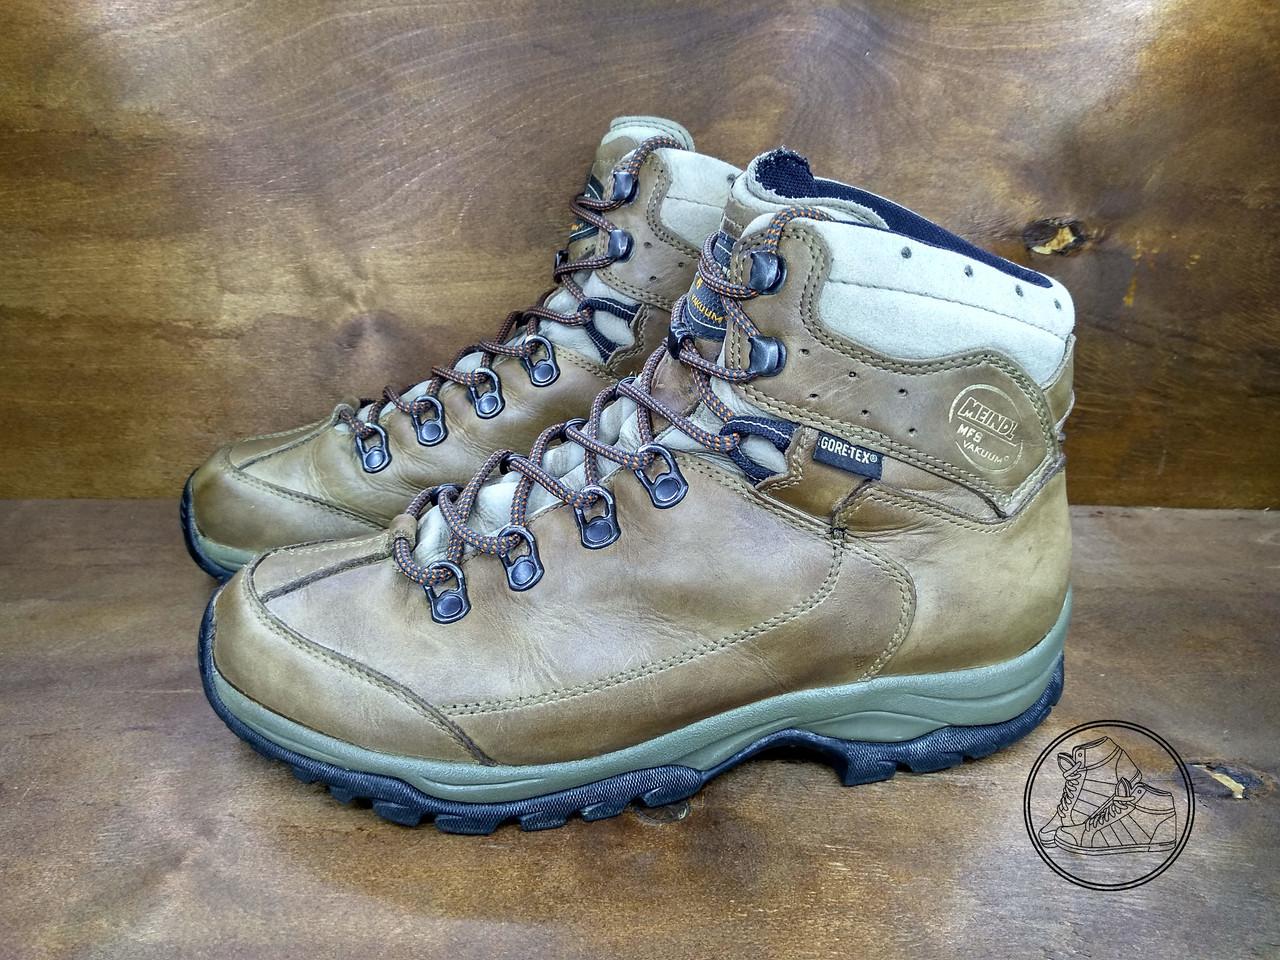 Ботинки Meindl Gore Tex (40 размер) бу - Интернет-магазин обуви из Европы 461407764a3